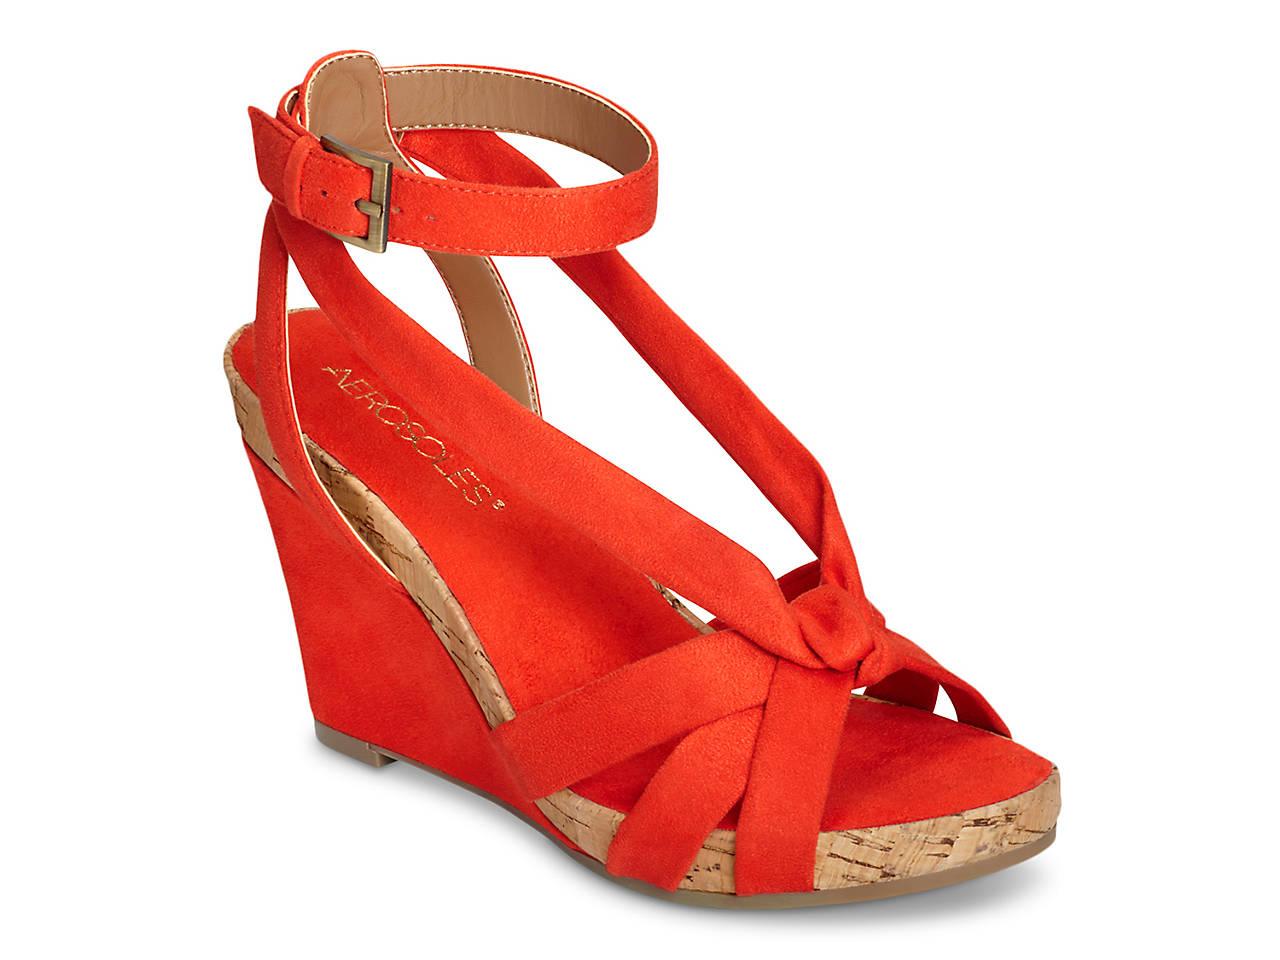 41d57d4864f9 Aerosoles Fashion Plush Wedge Sandal Women s Shoes